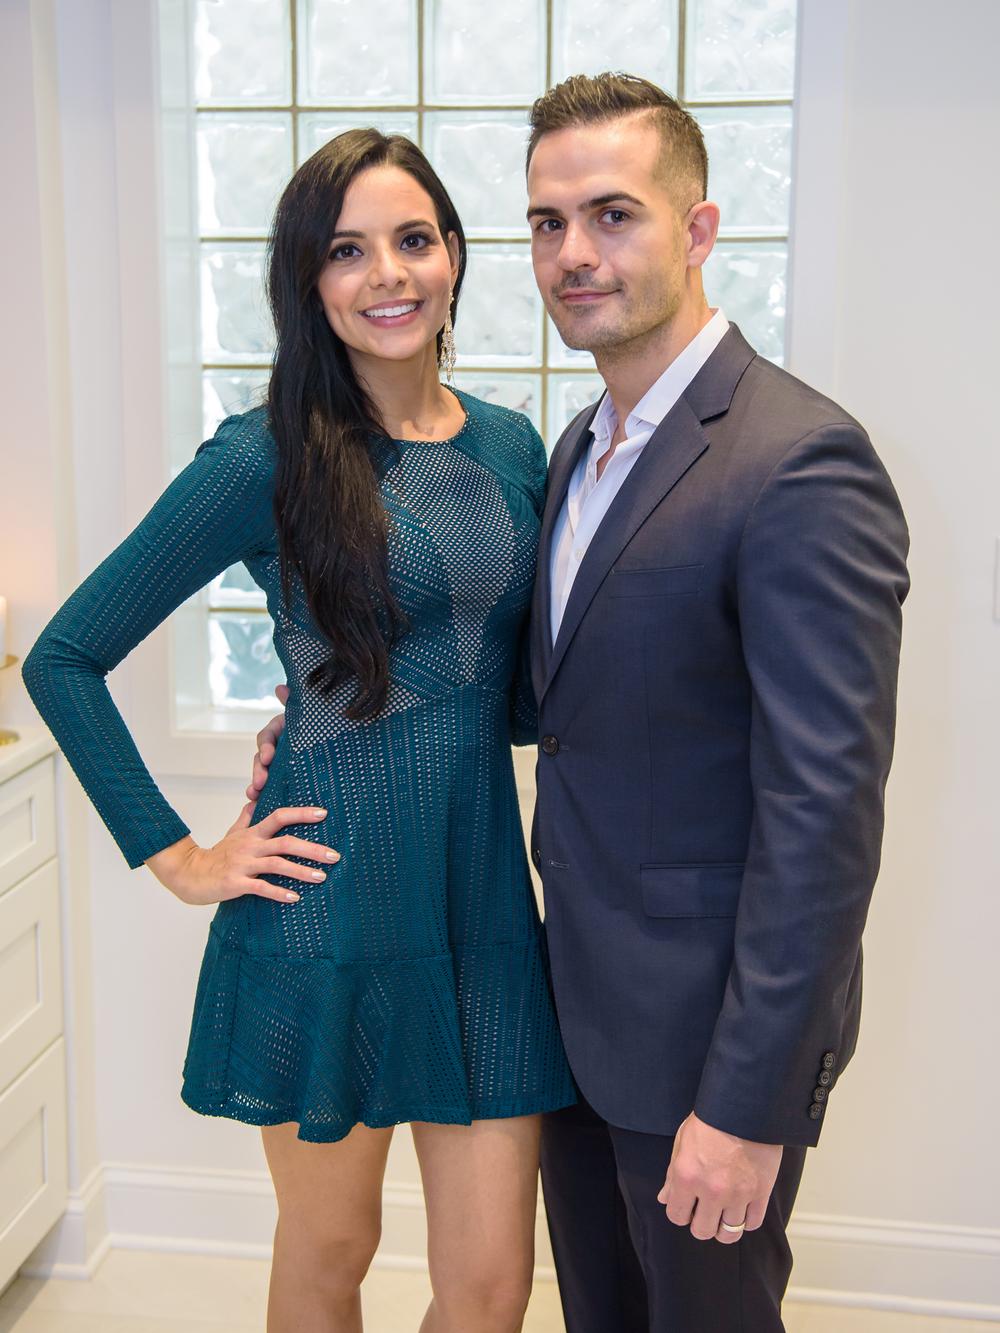 Jennifer and Leandro Da Silva, owners of Dasi Salon.